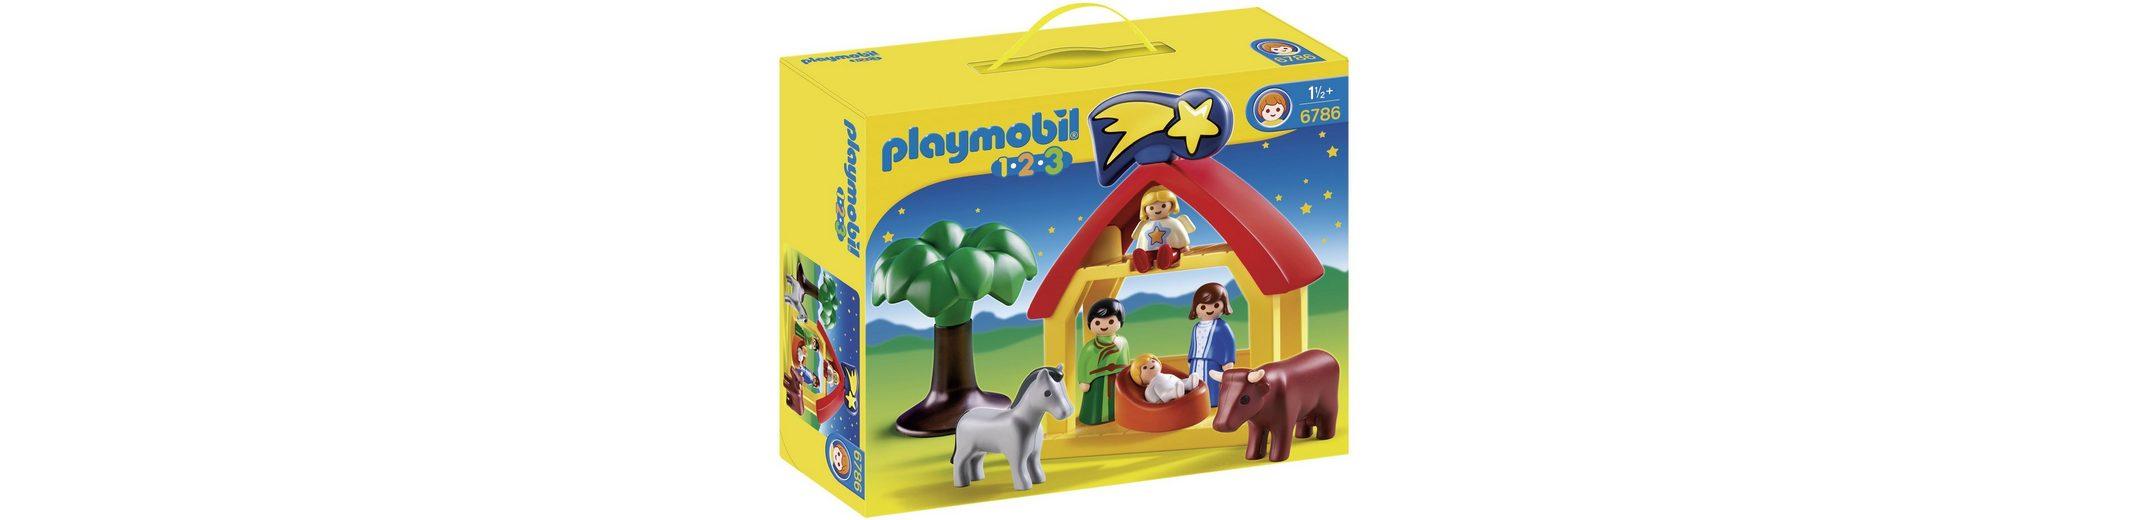 Playmobil® Weihnachtskrippe (6786), Playmobil 1-2-3